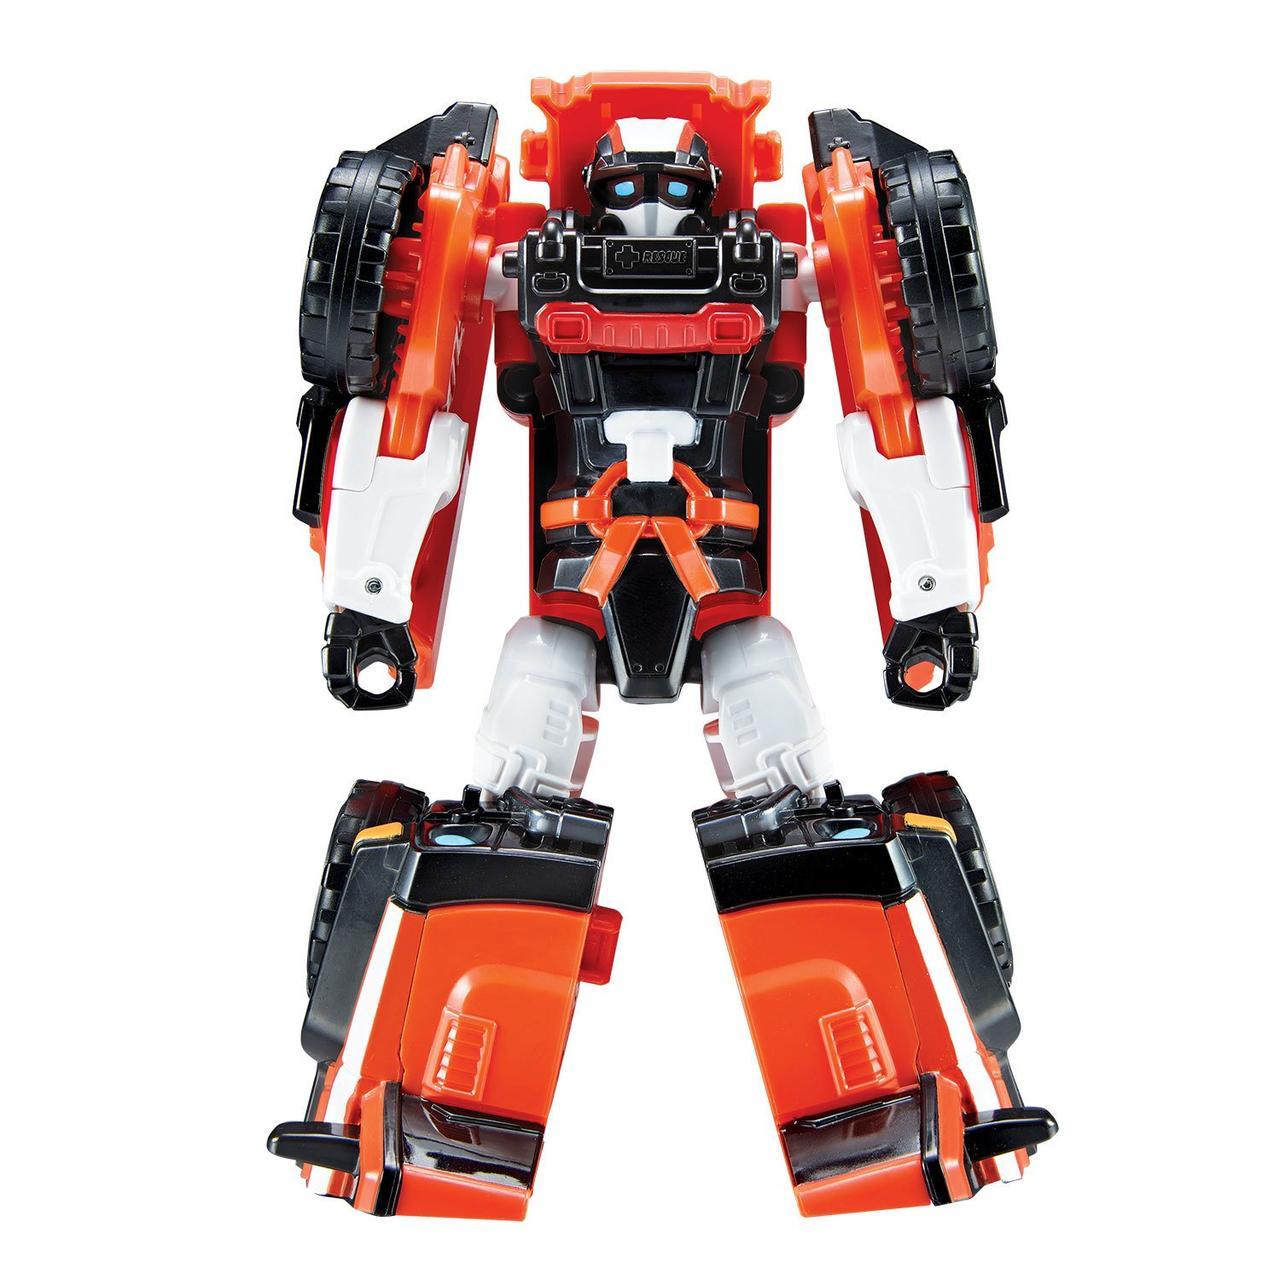 "Tobot Робот-трансформер Тобот Атлон Амбулан S3 ""Мини"""